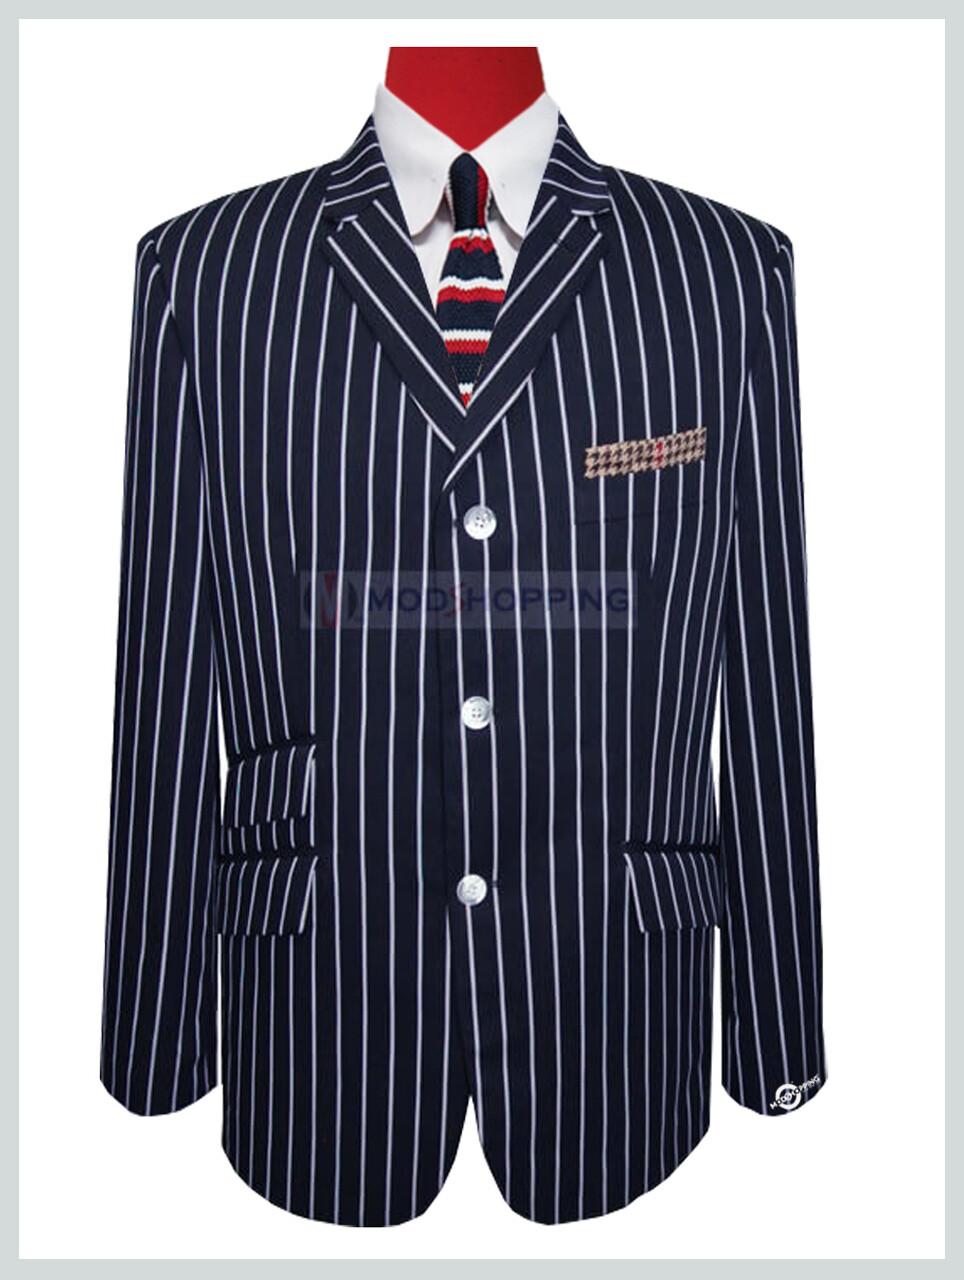 3 button mod navy blue tailored stripe boating blazer 60s mod fashion